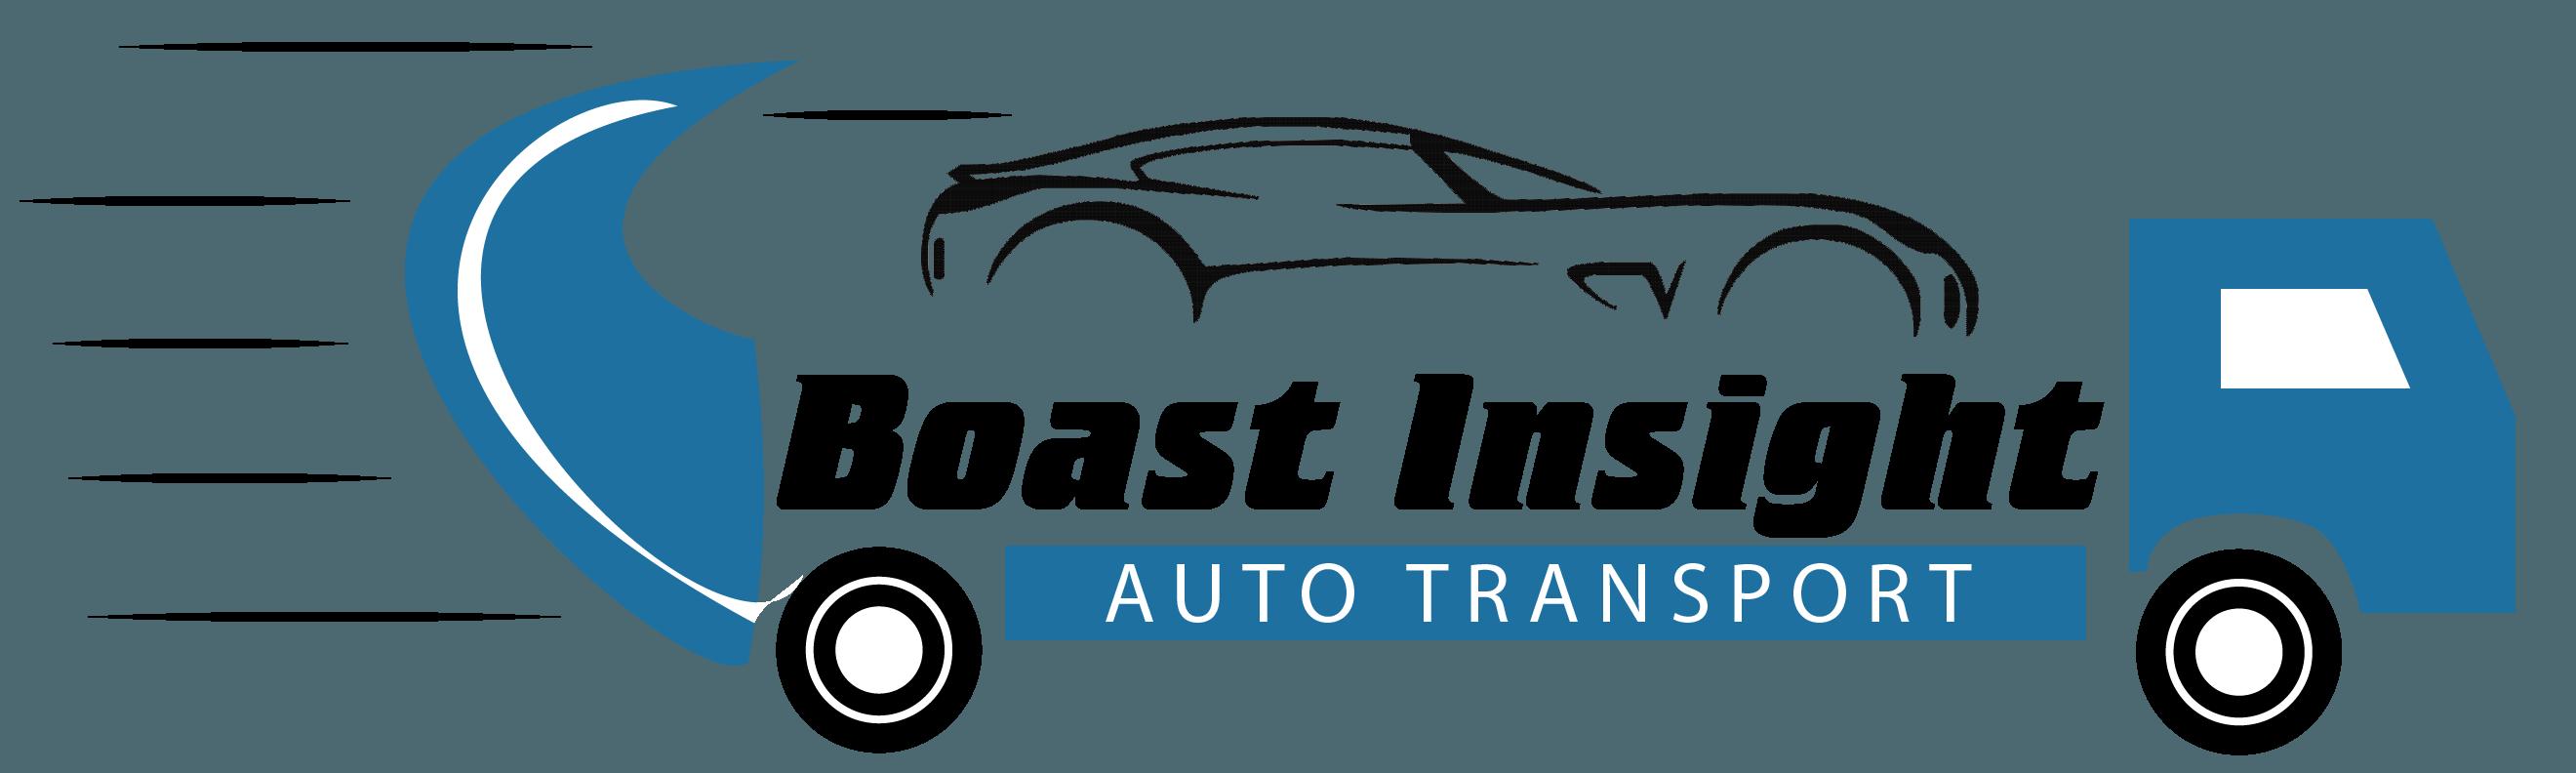 Auto Transport Logo - LogoDix